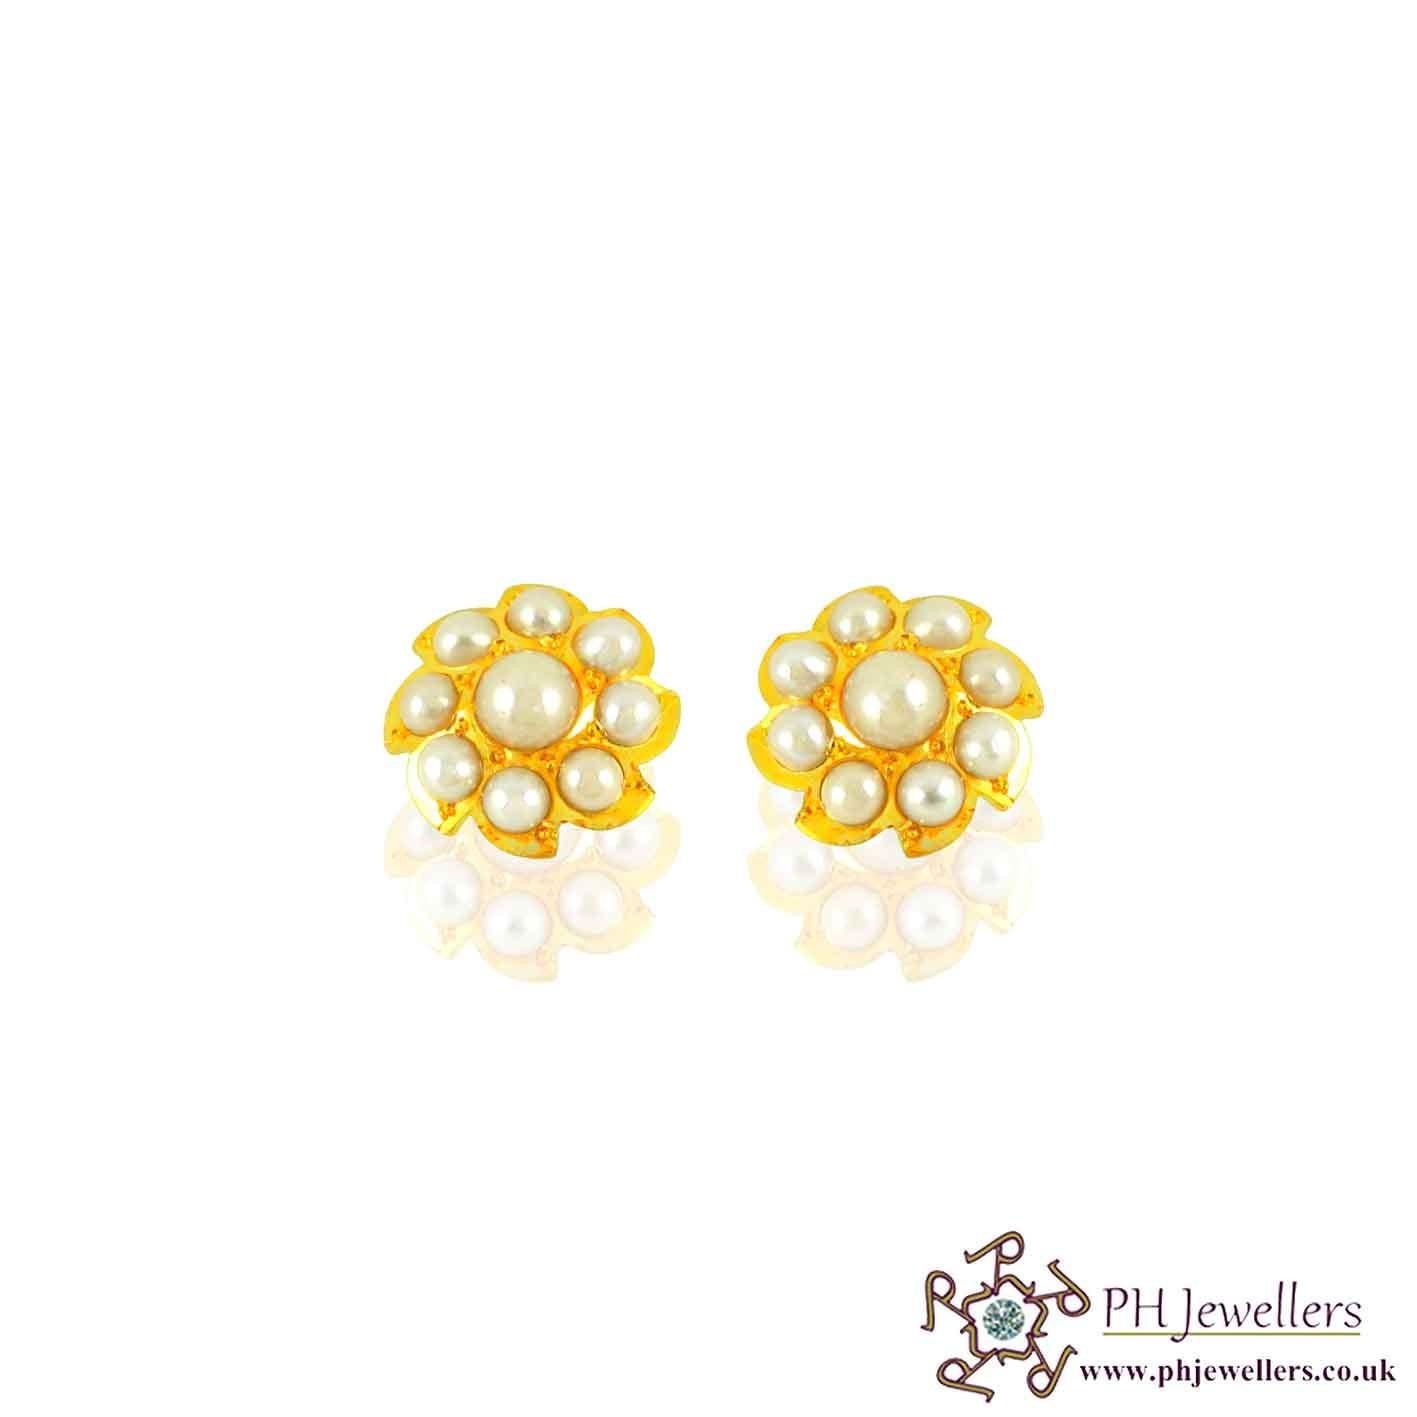 22CT 916 Hallmark Yellow Gold Tops Round Earring Pearl TE22